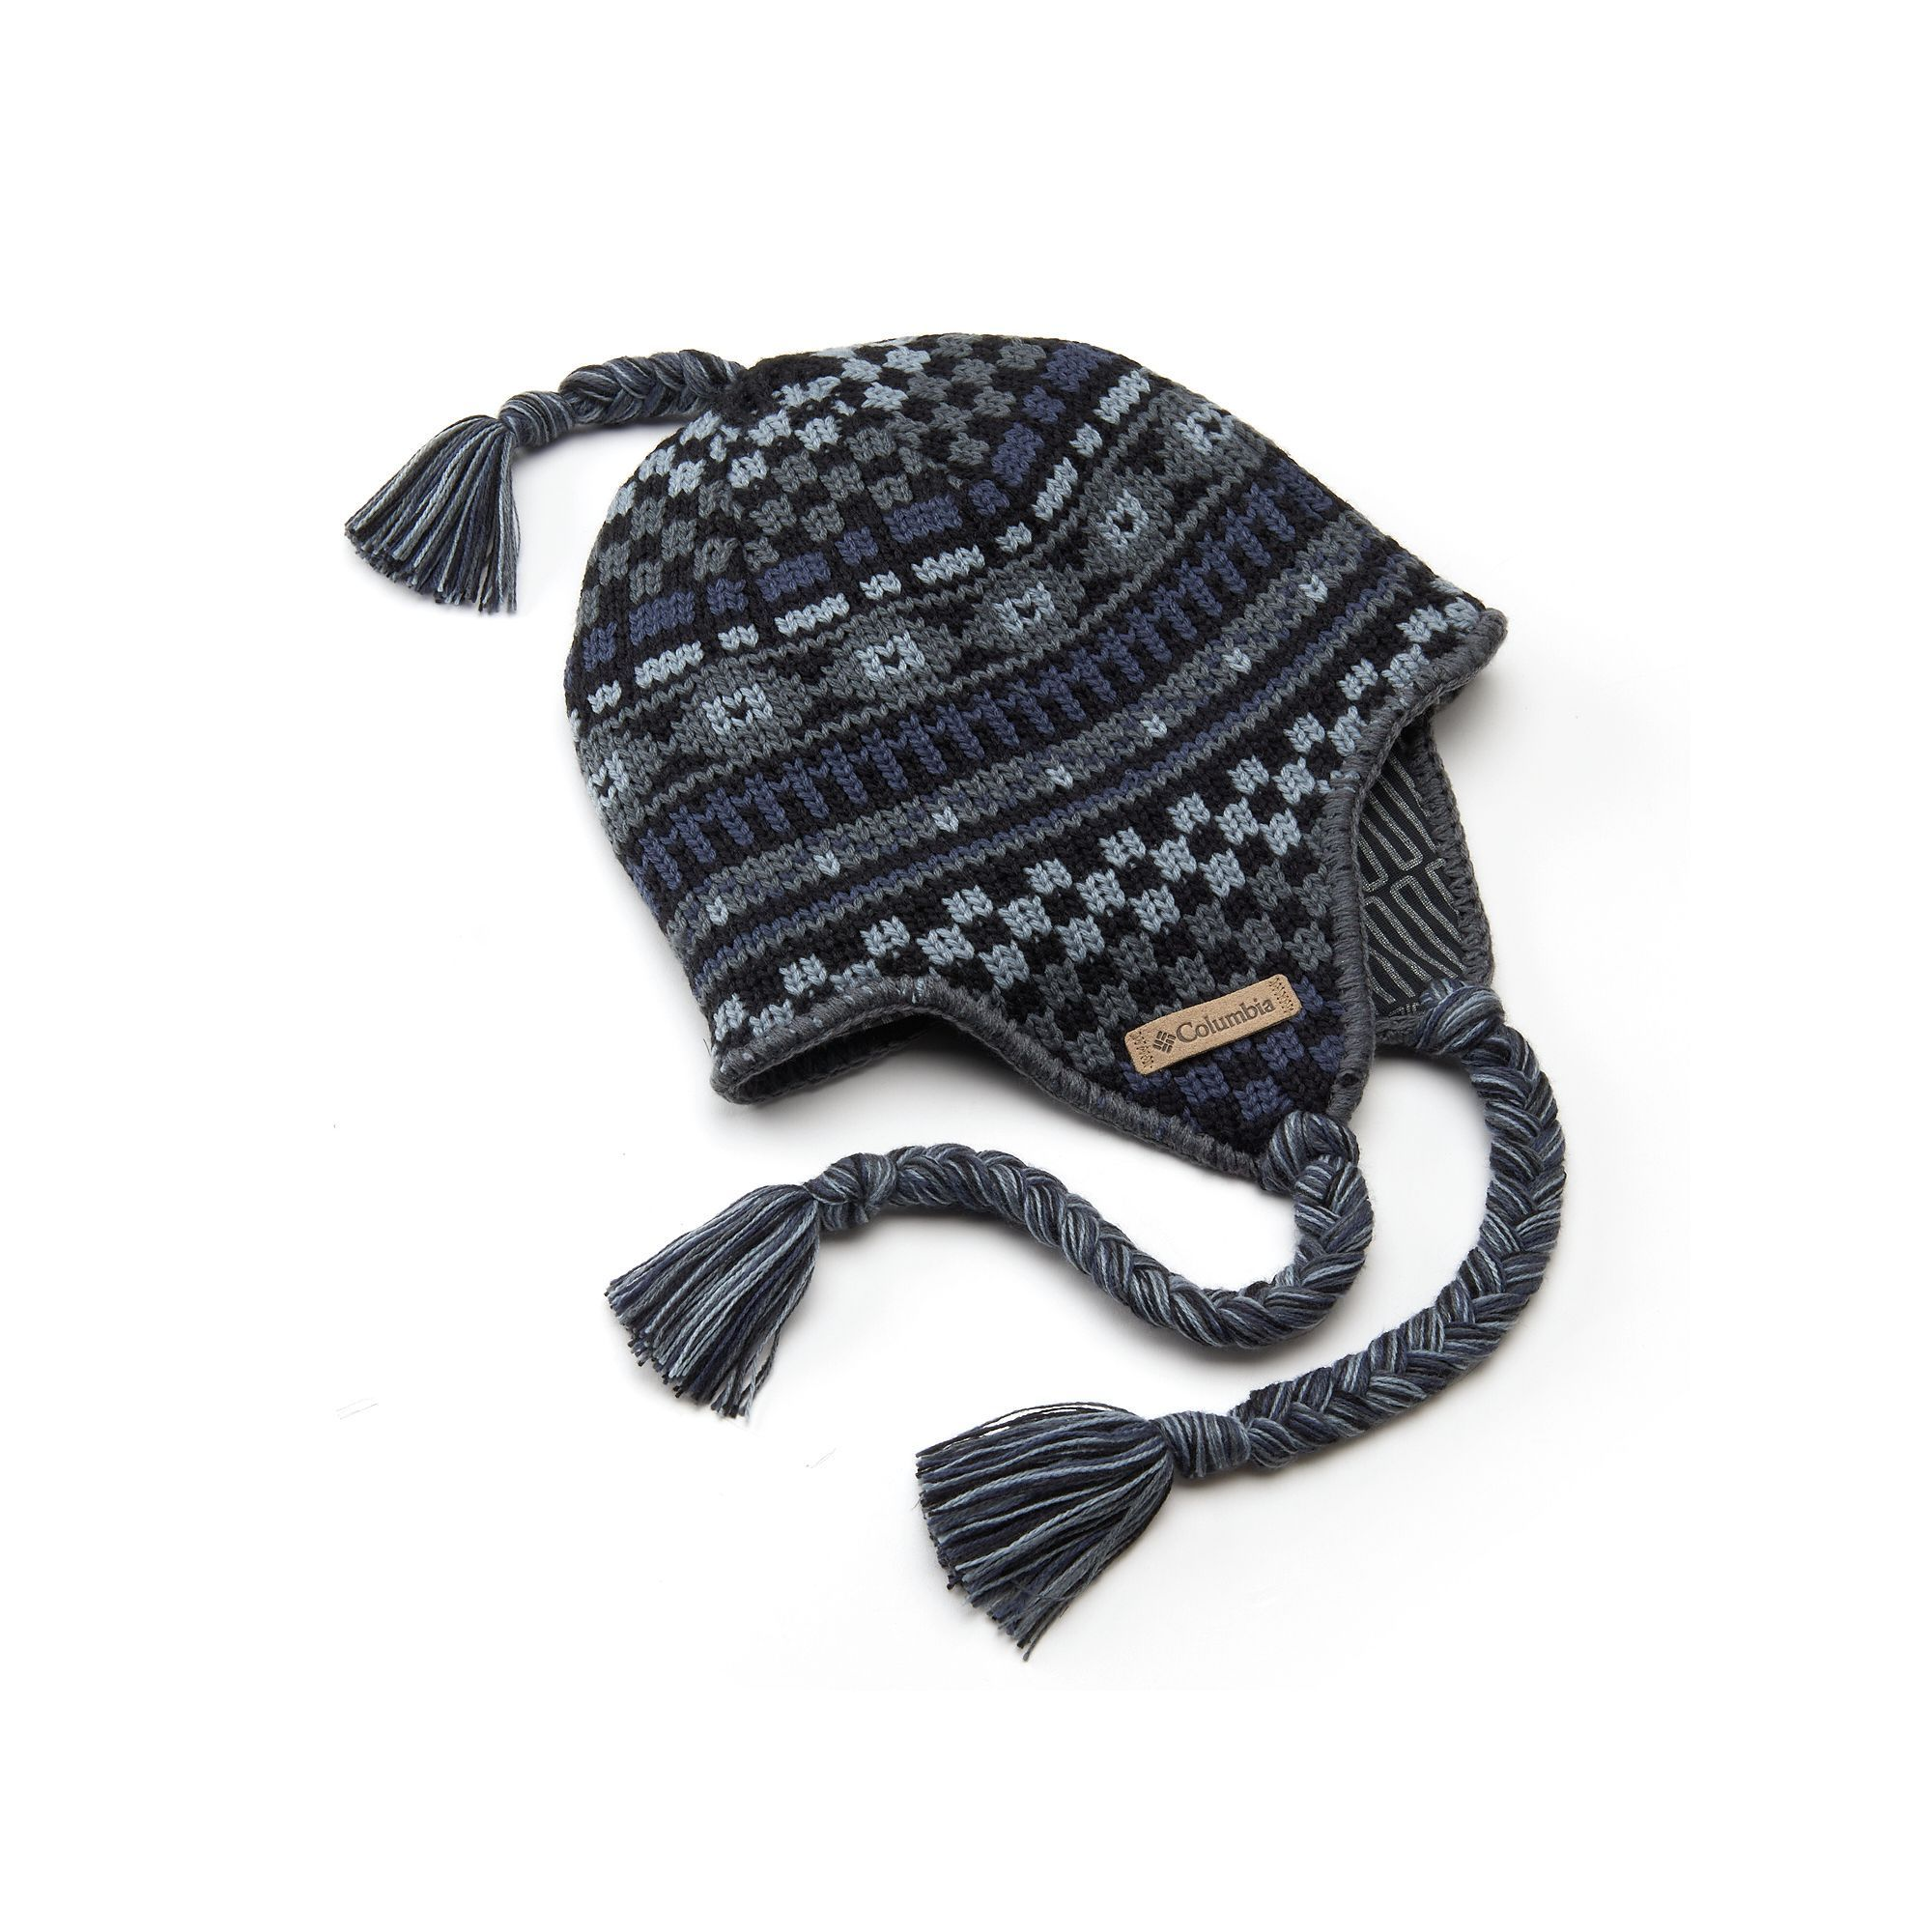 ca70357e6198c Columbia Thermal Fleece Knit Trapper Hat - Women